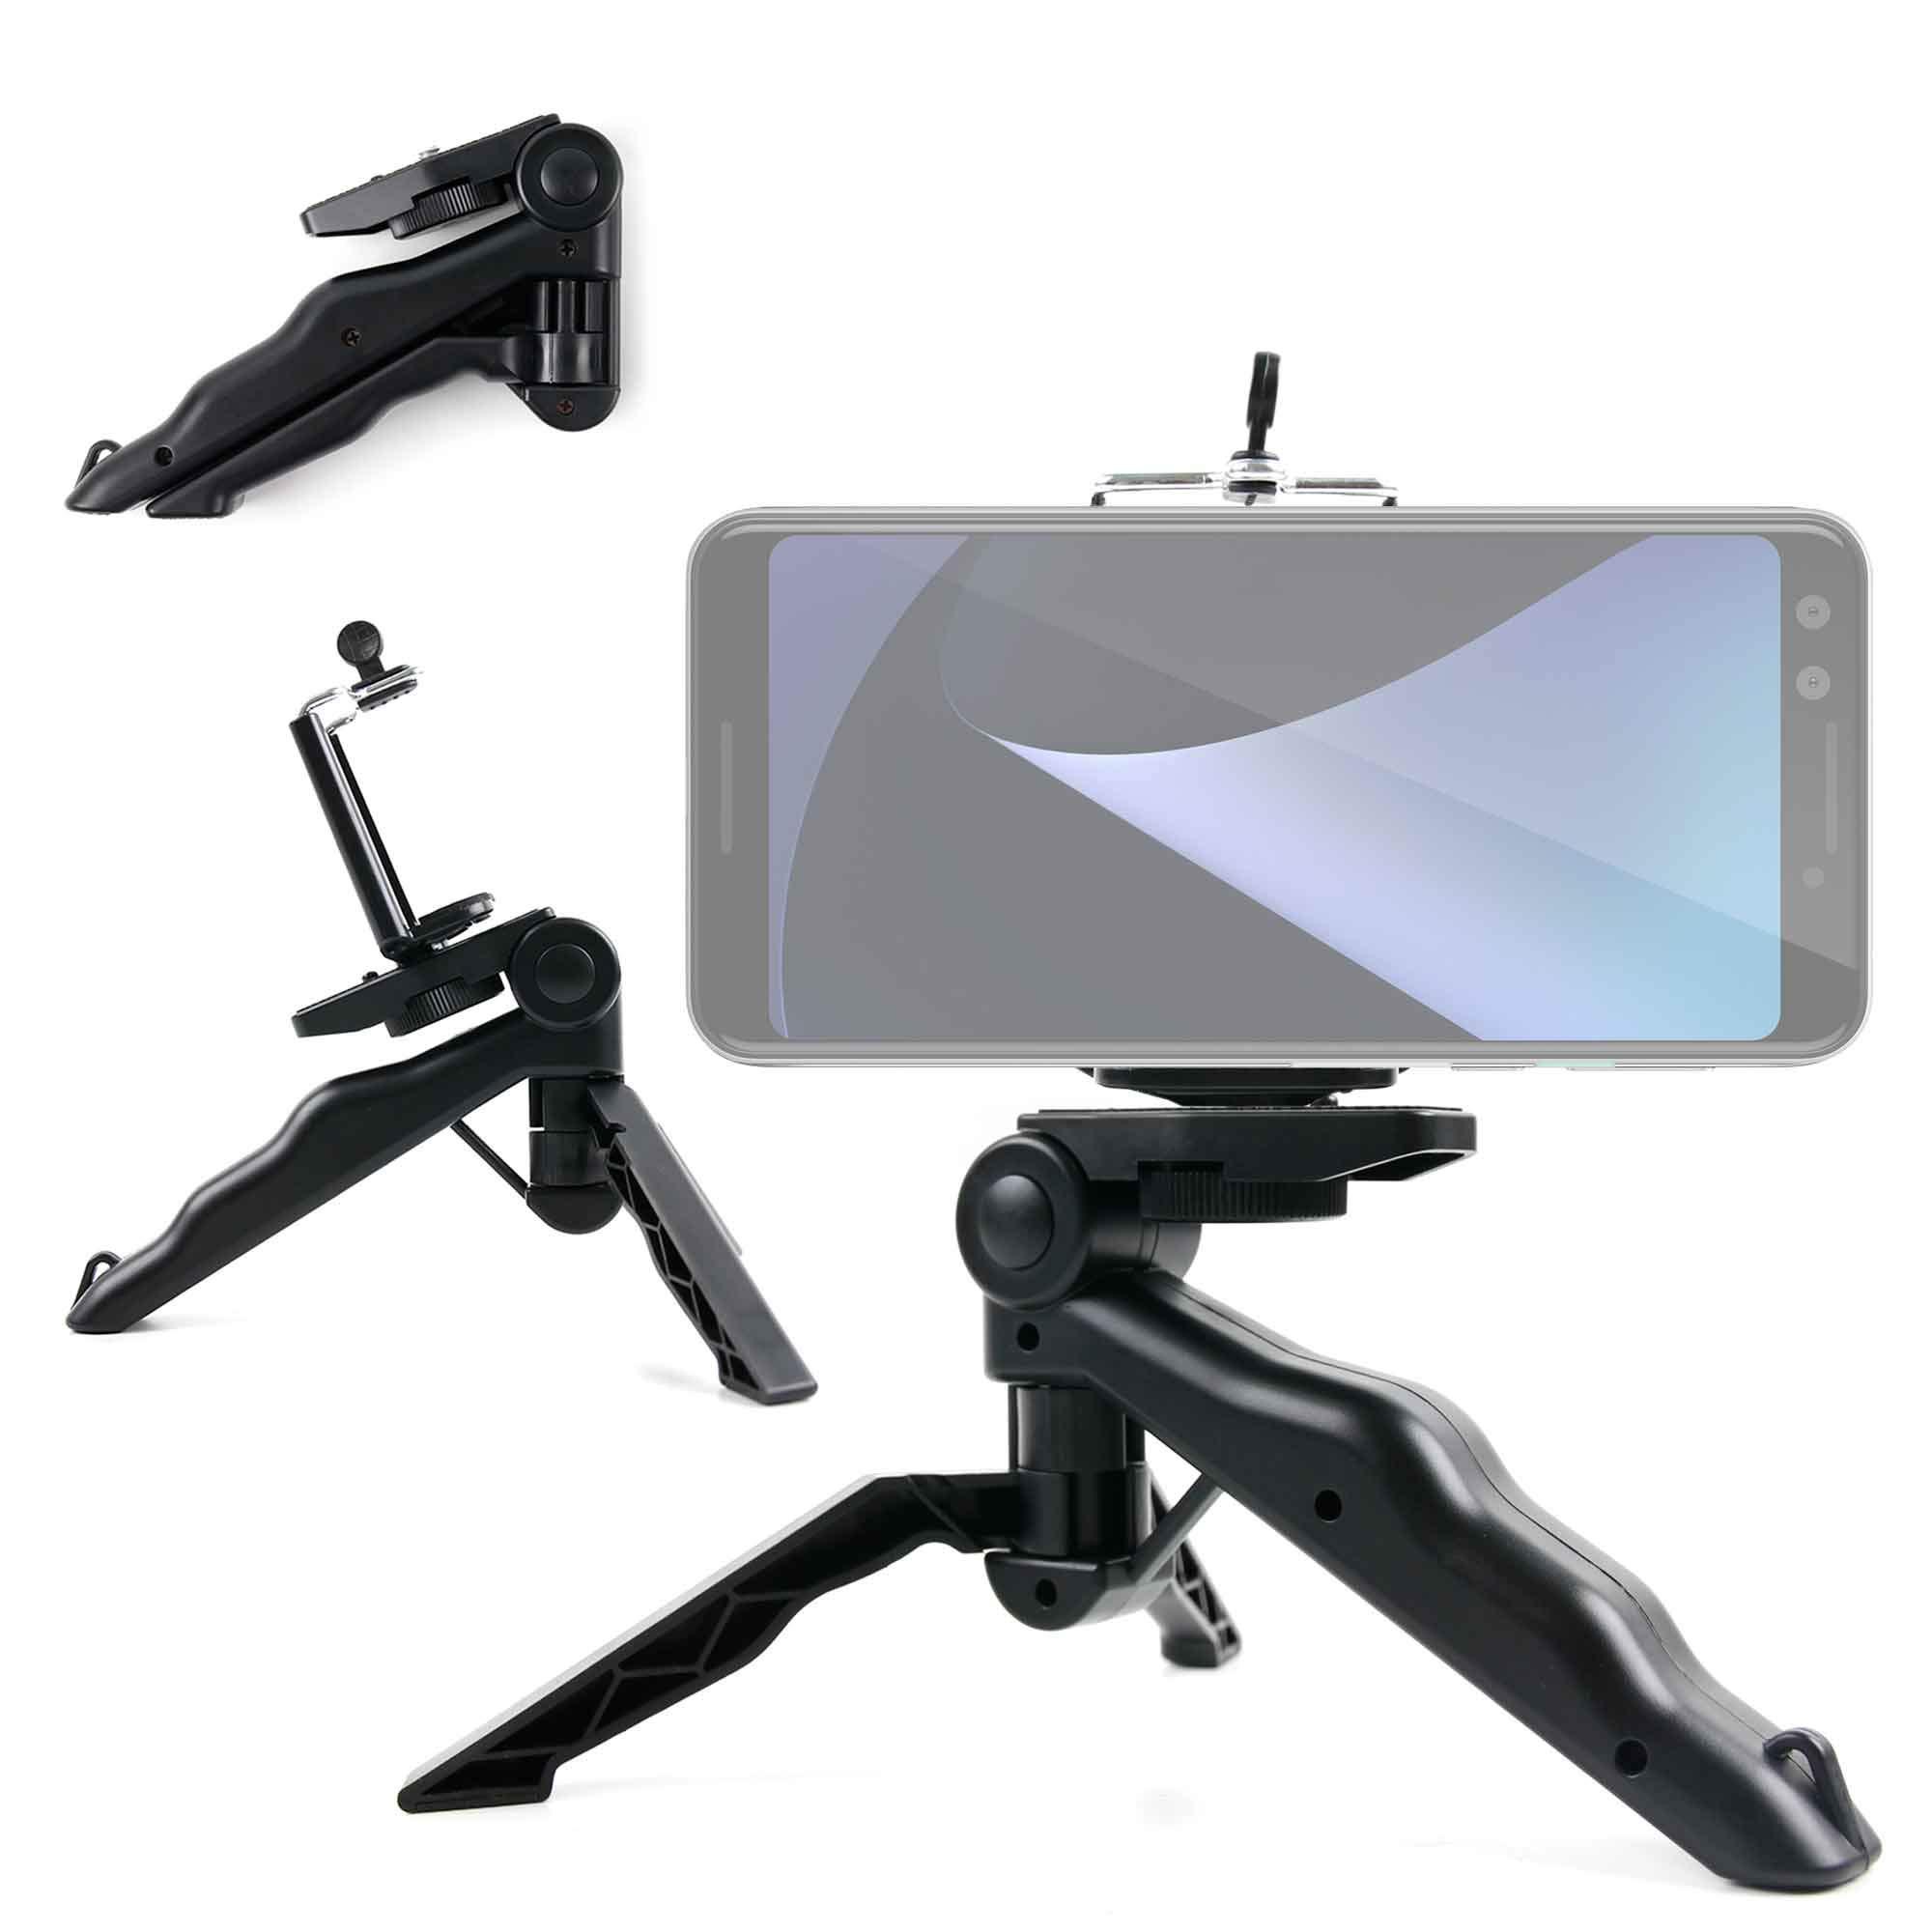 DURAGADGET Mini Trípode/Selfie Stick para Smartphone Google Pixel ...